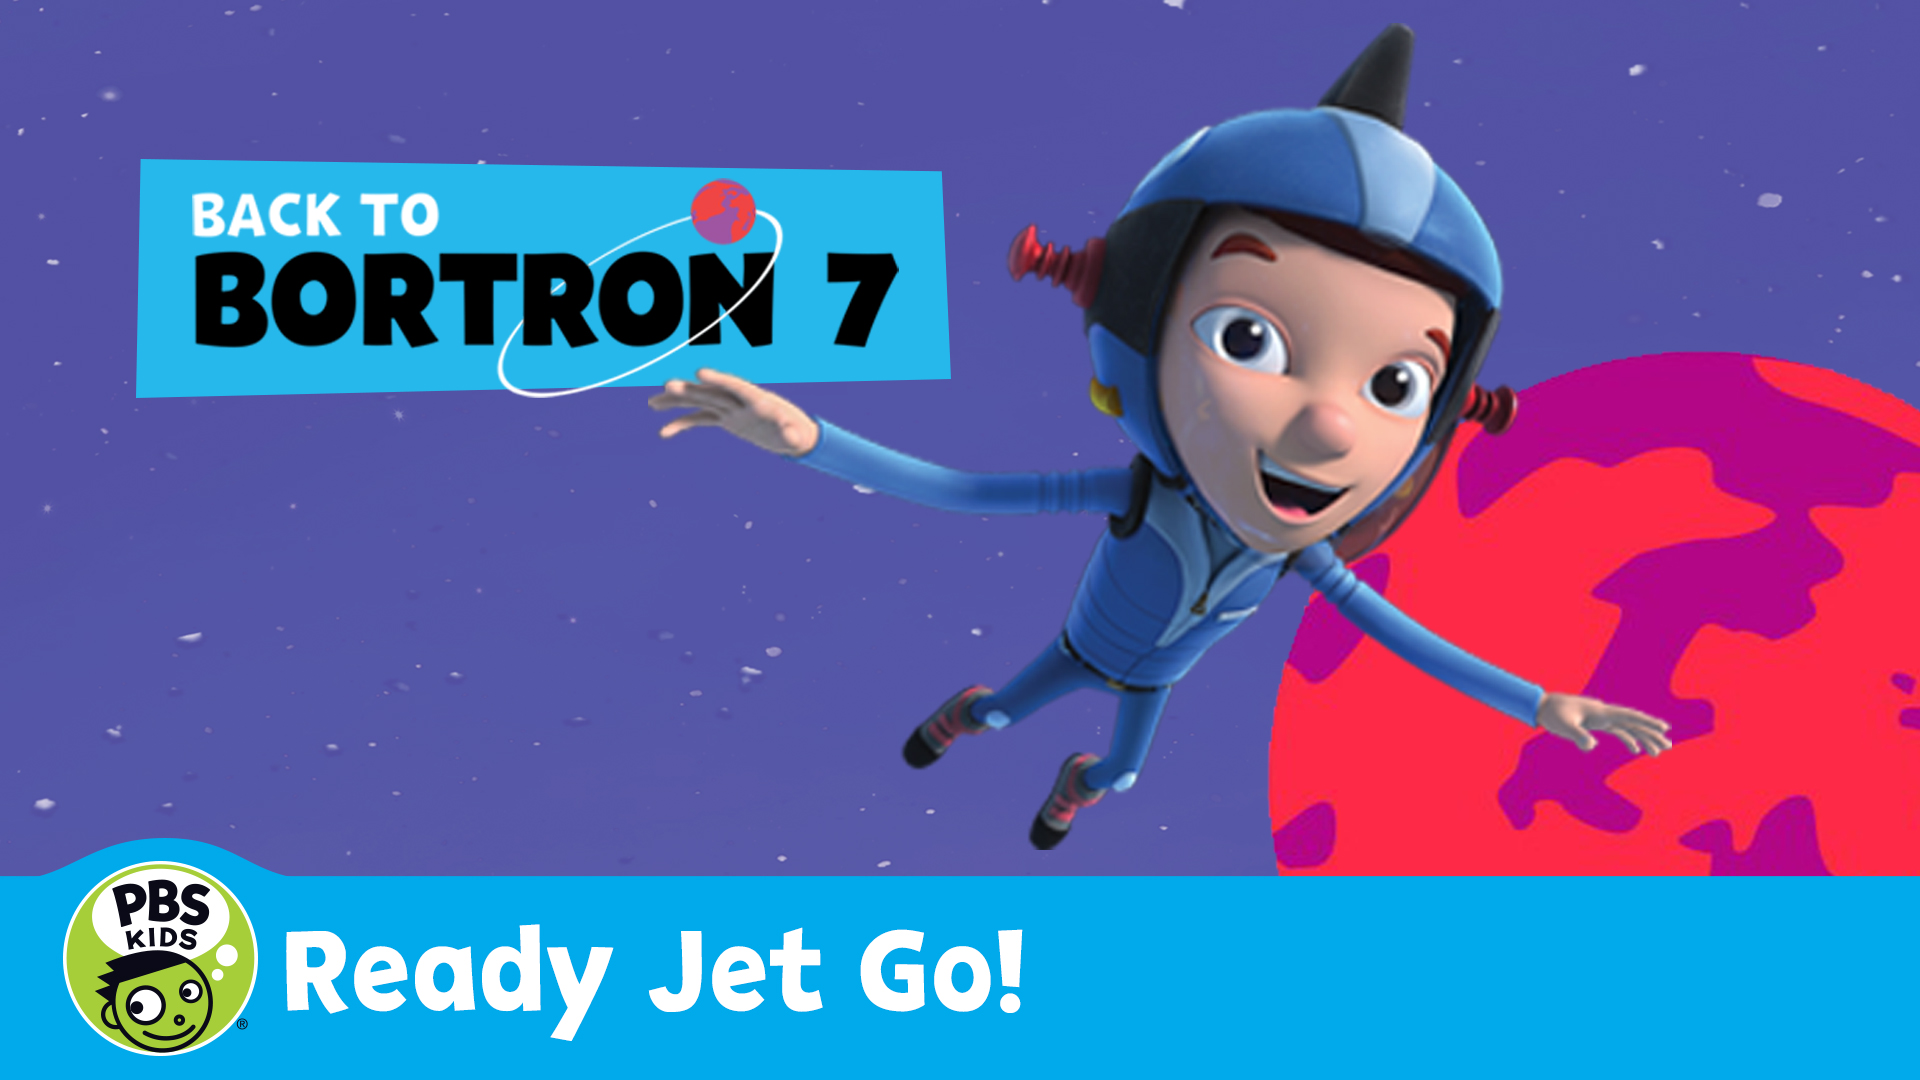 Ready Jet Go!: Back to Bortron 7